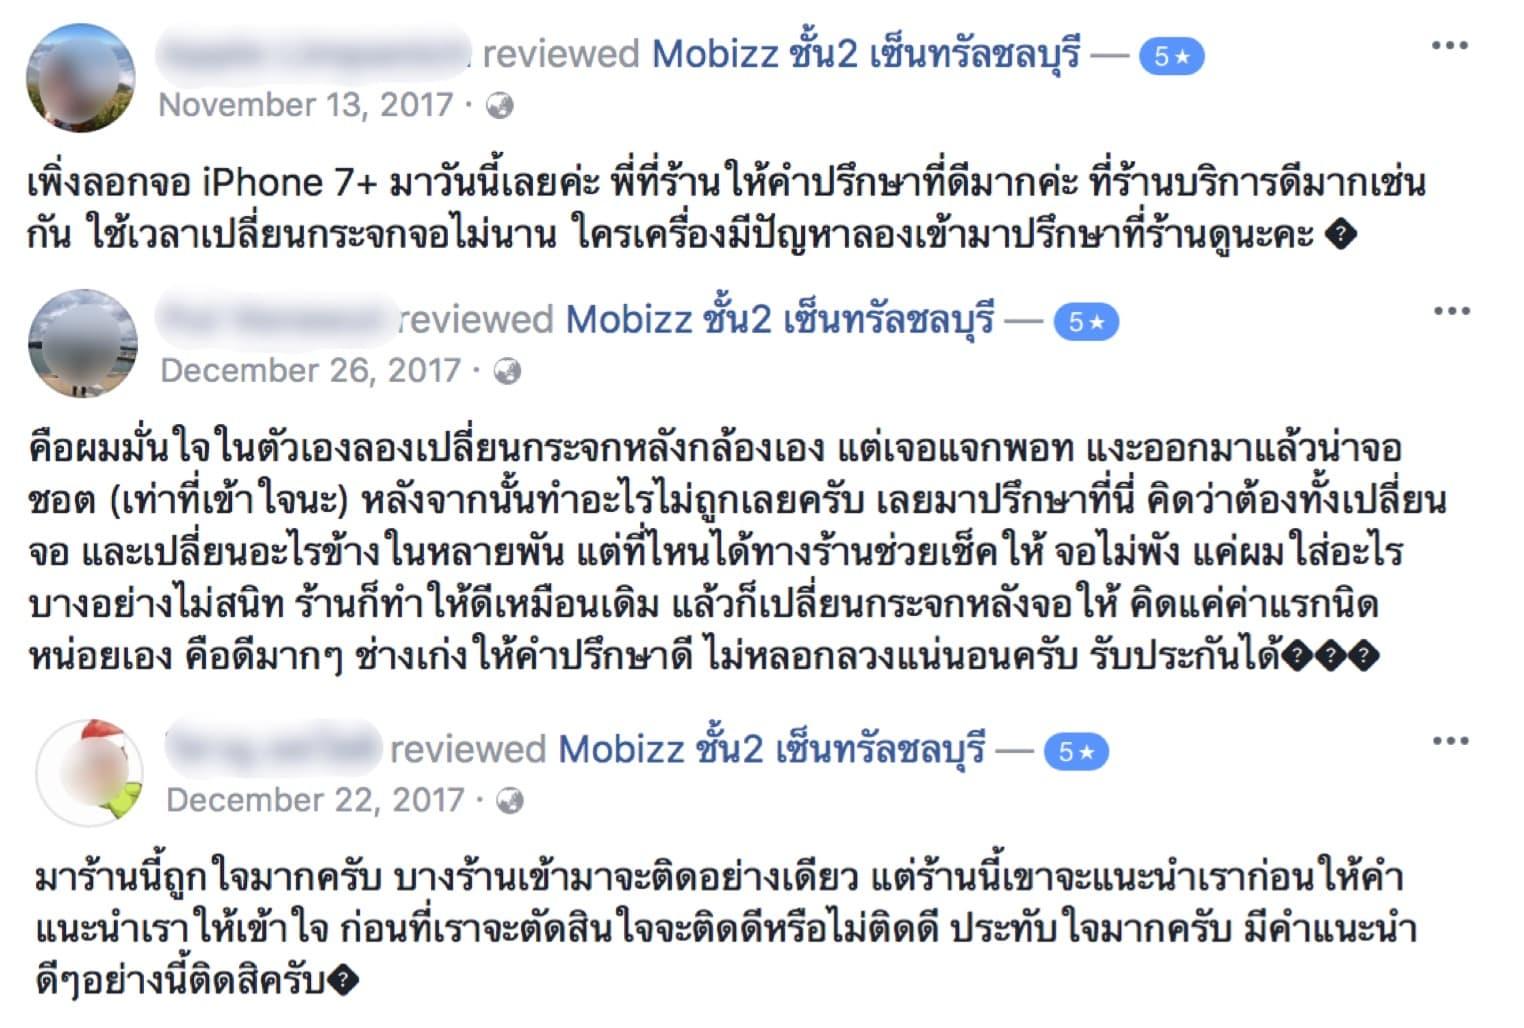 Mobizz Customer Review